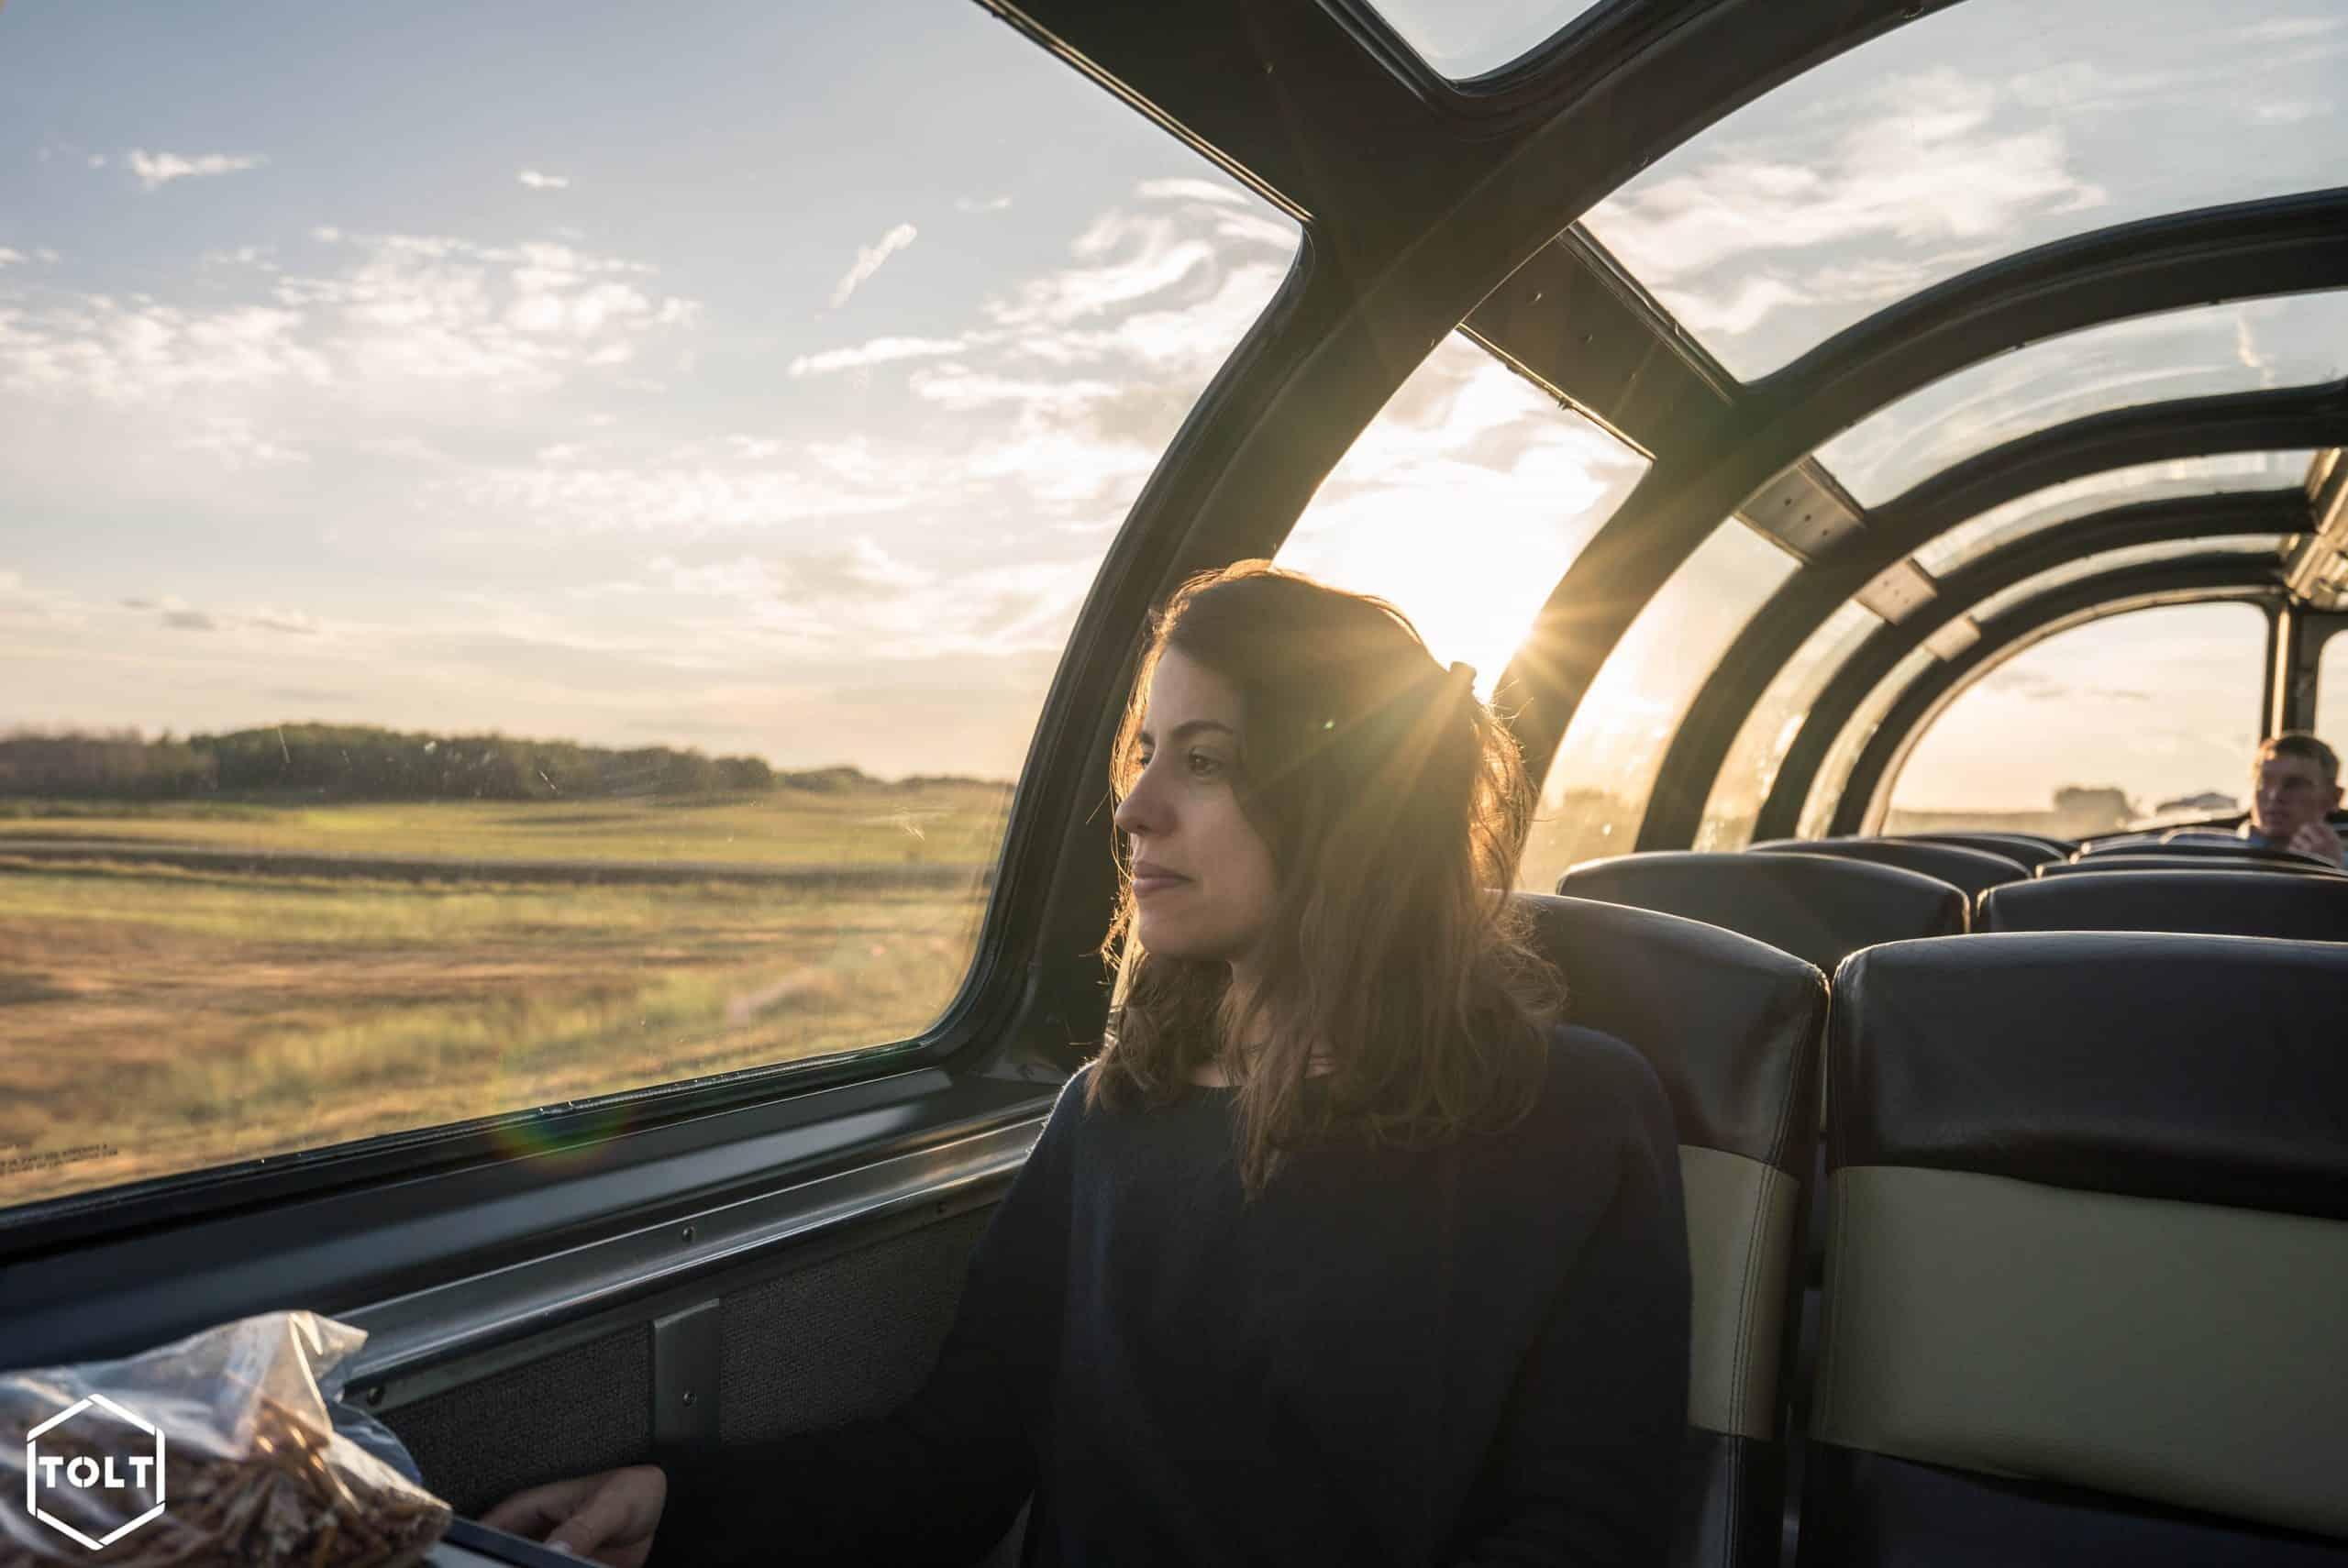 Traversée Canada train Via rail